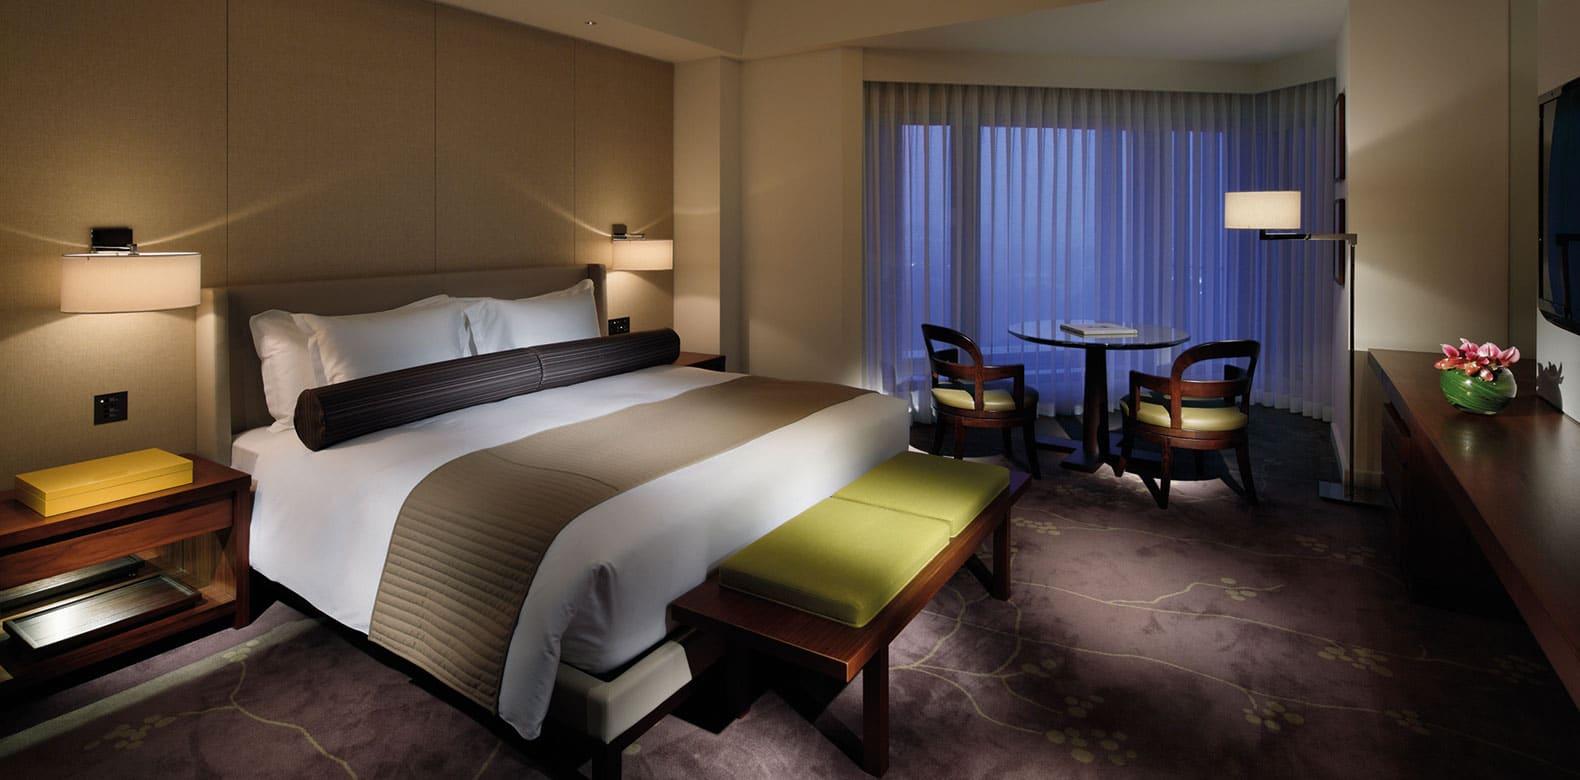 Palace Hotel Tokyo  Best Hotels Tokyo  Marunouchi  Deluxe Room